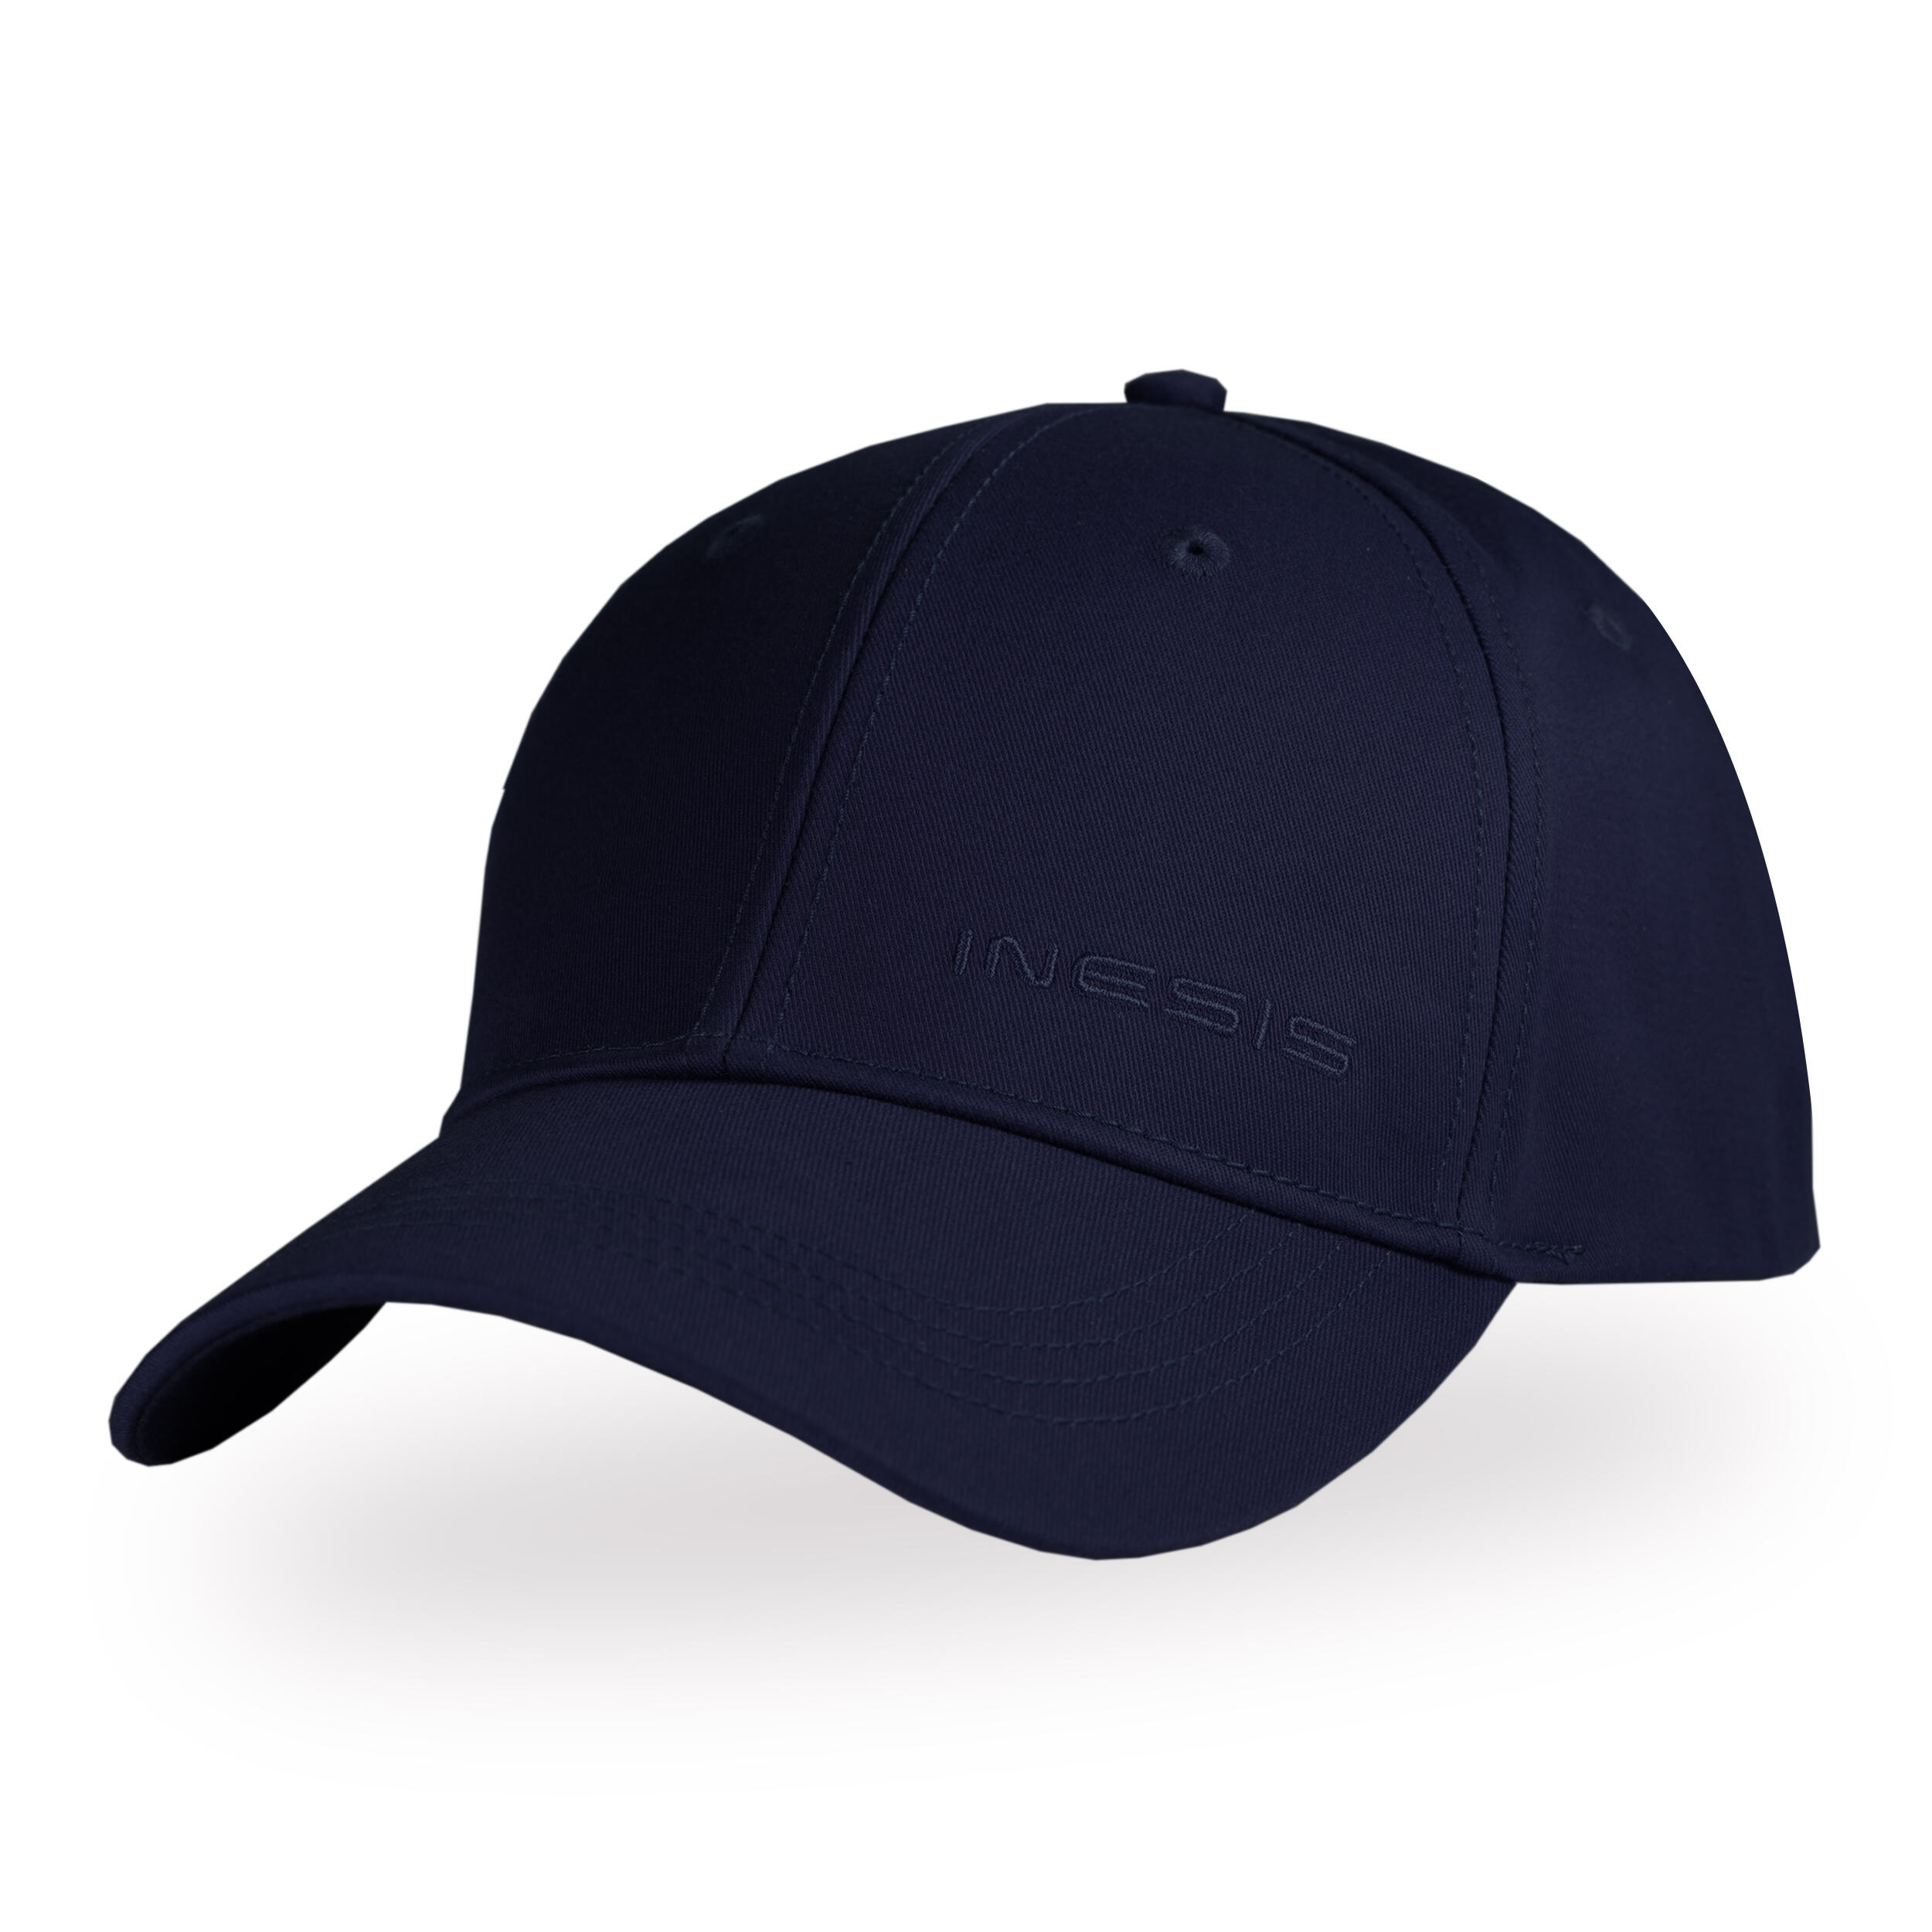 Golf Cap Erwachsene marineblau | Accessoires > Caps | Blau | Inesis